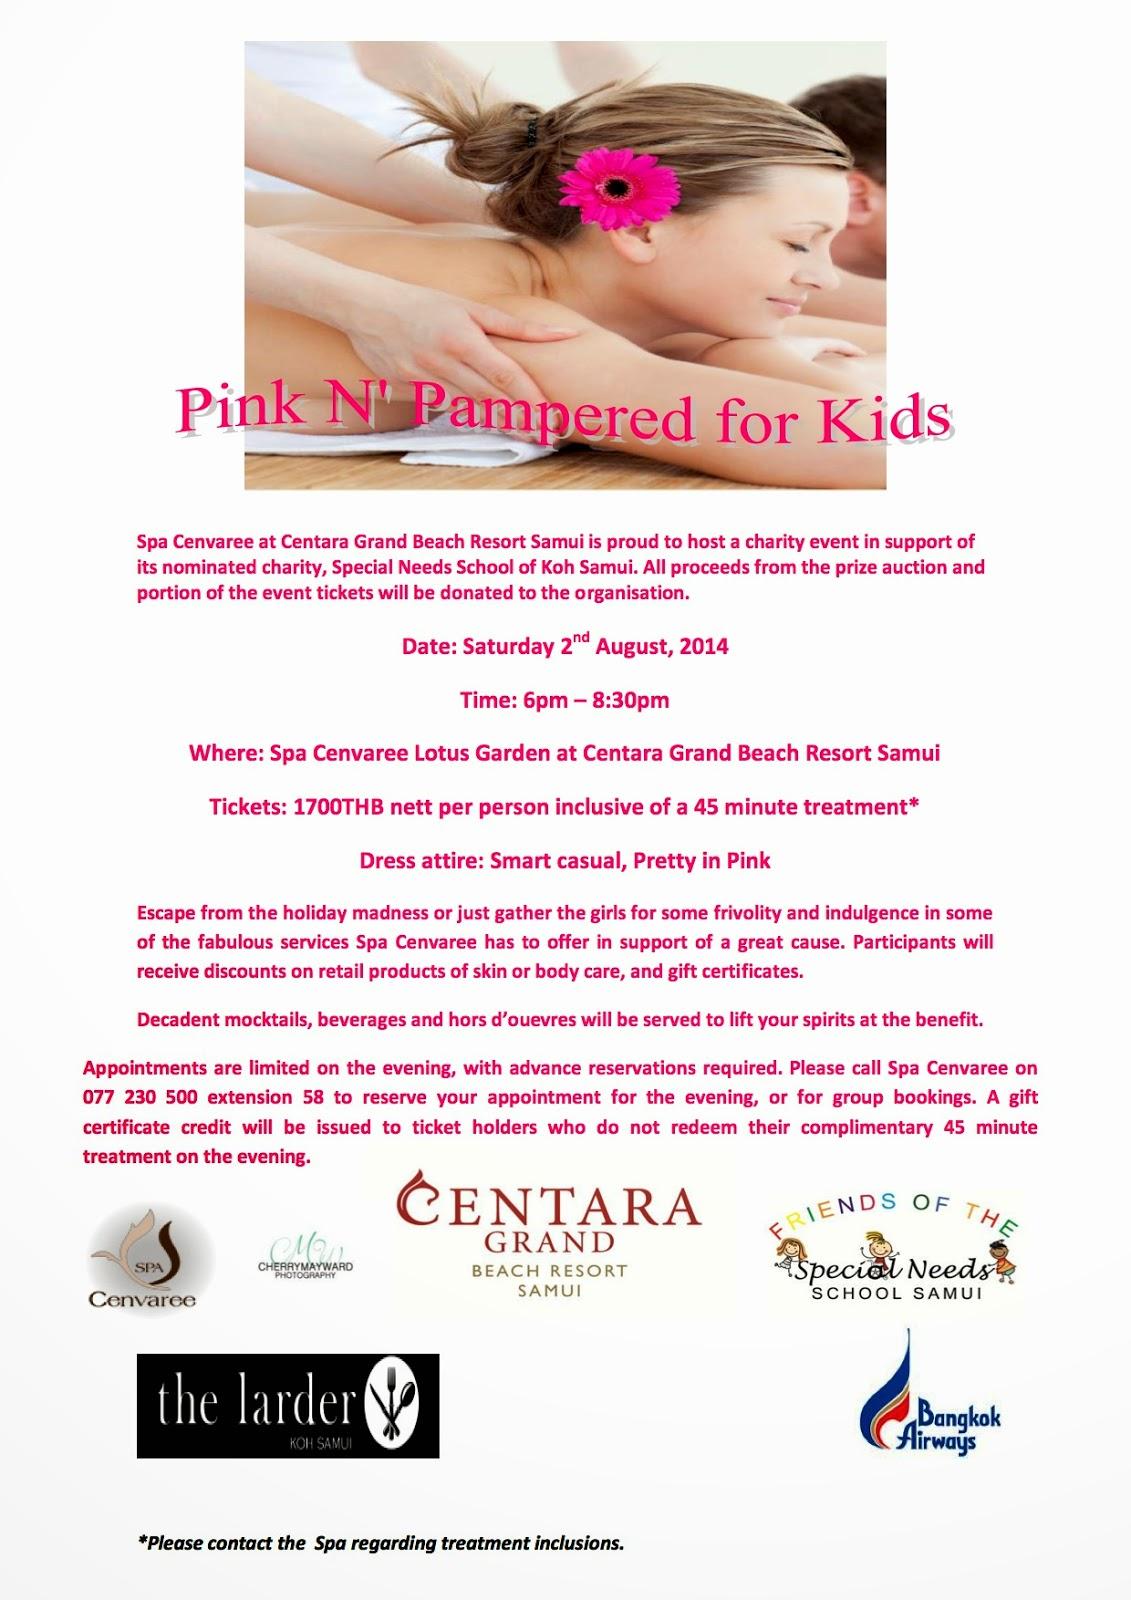 Pink N' Pampered for Kids, Koh Samui Charity event held at Centara Grand Beach Resort Samui, Charities in Thailand, upcoming Charity evening on Koh Samui